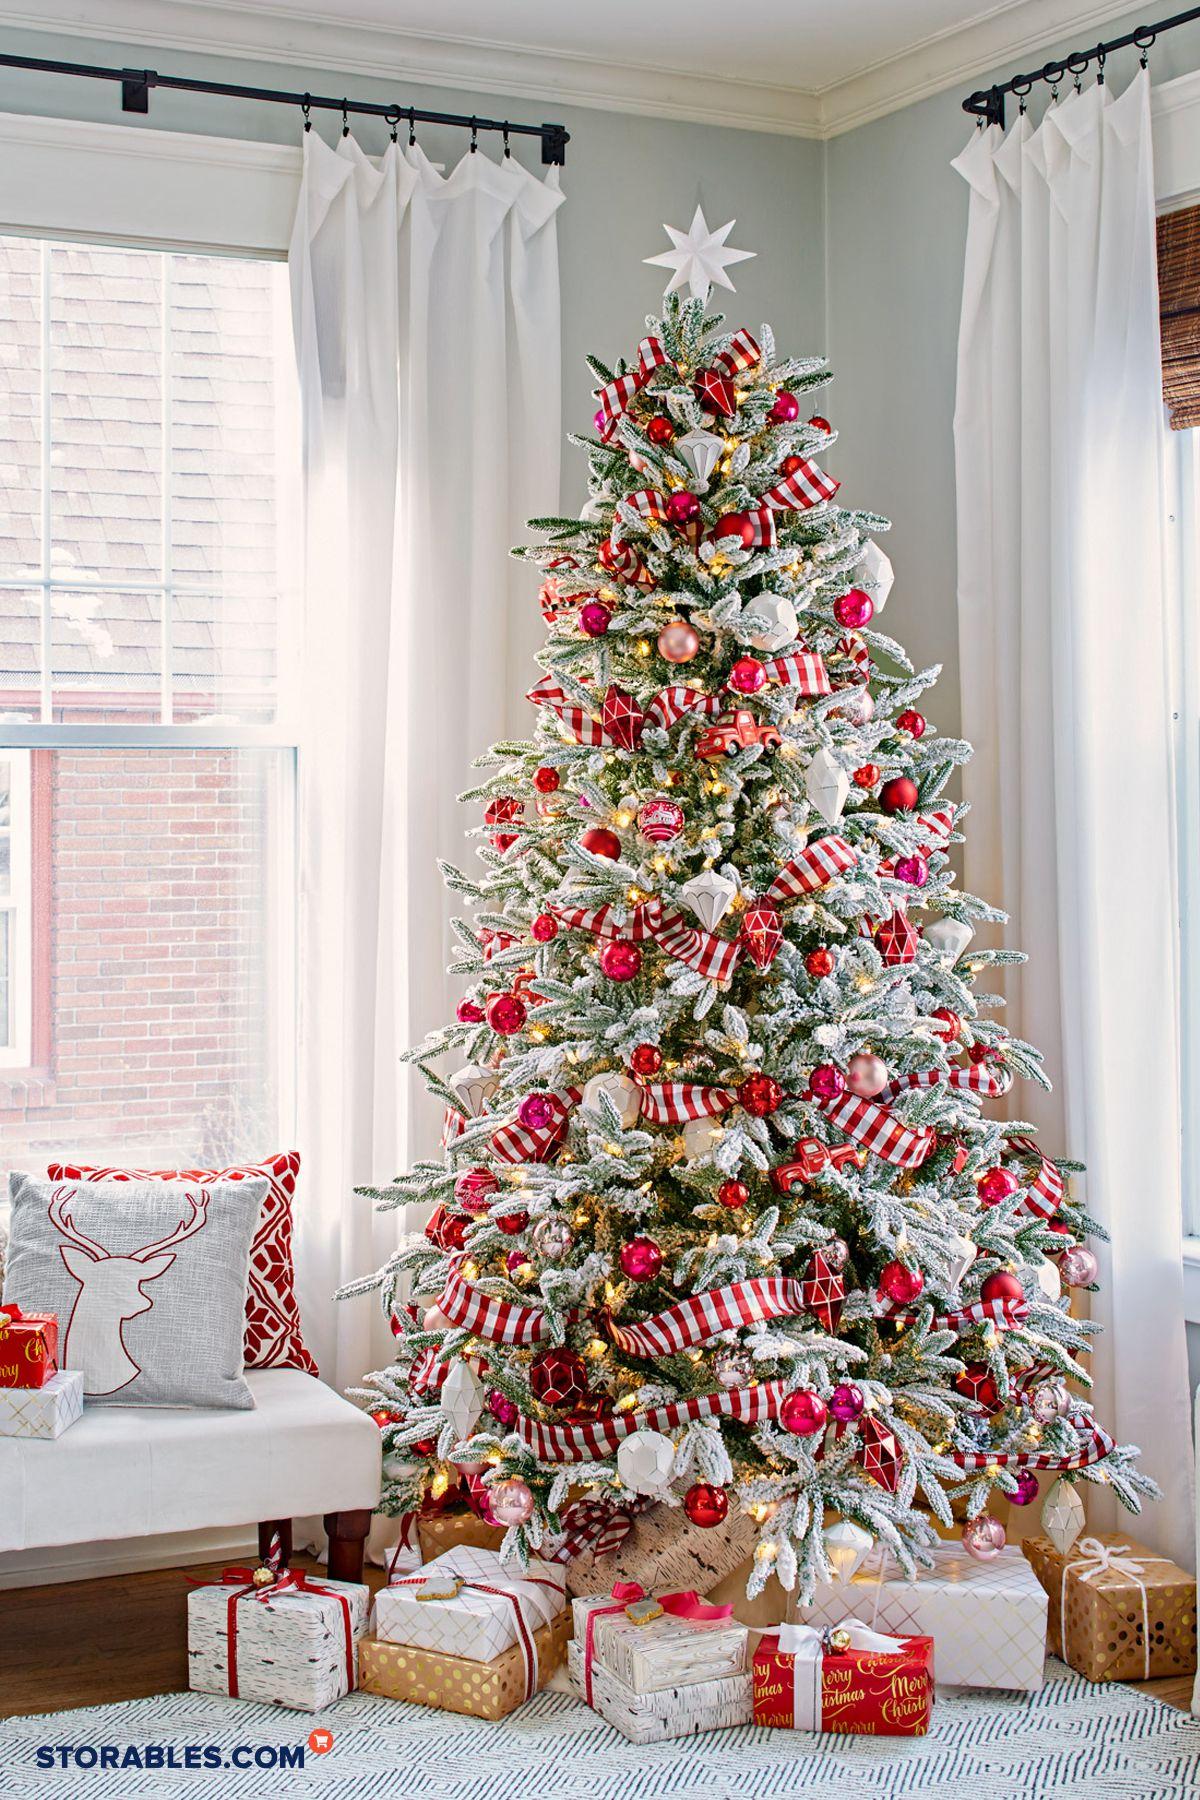 10 Stunning White Christmas Tree Decor Ideas White Christmas Tree Decorations White Christmas Decor Christmas Tree Inspiration